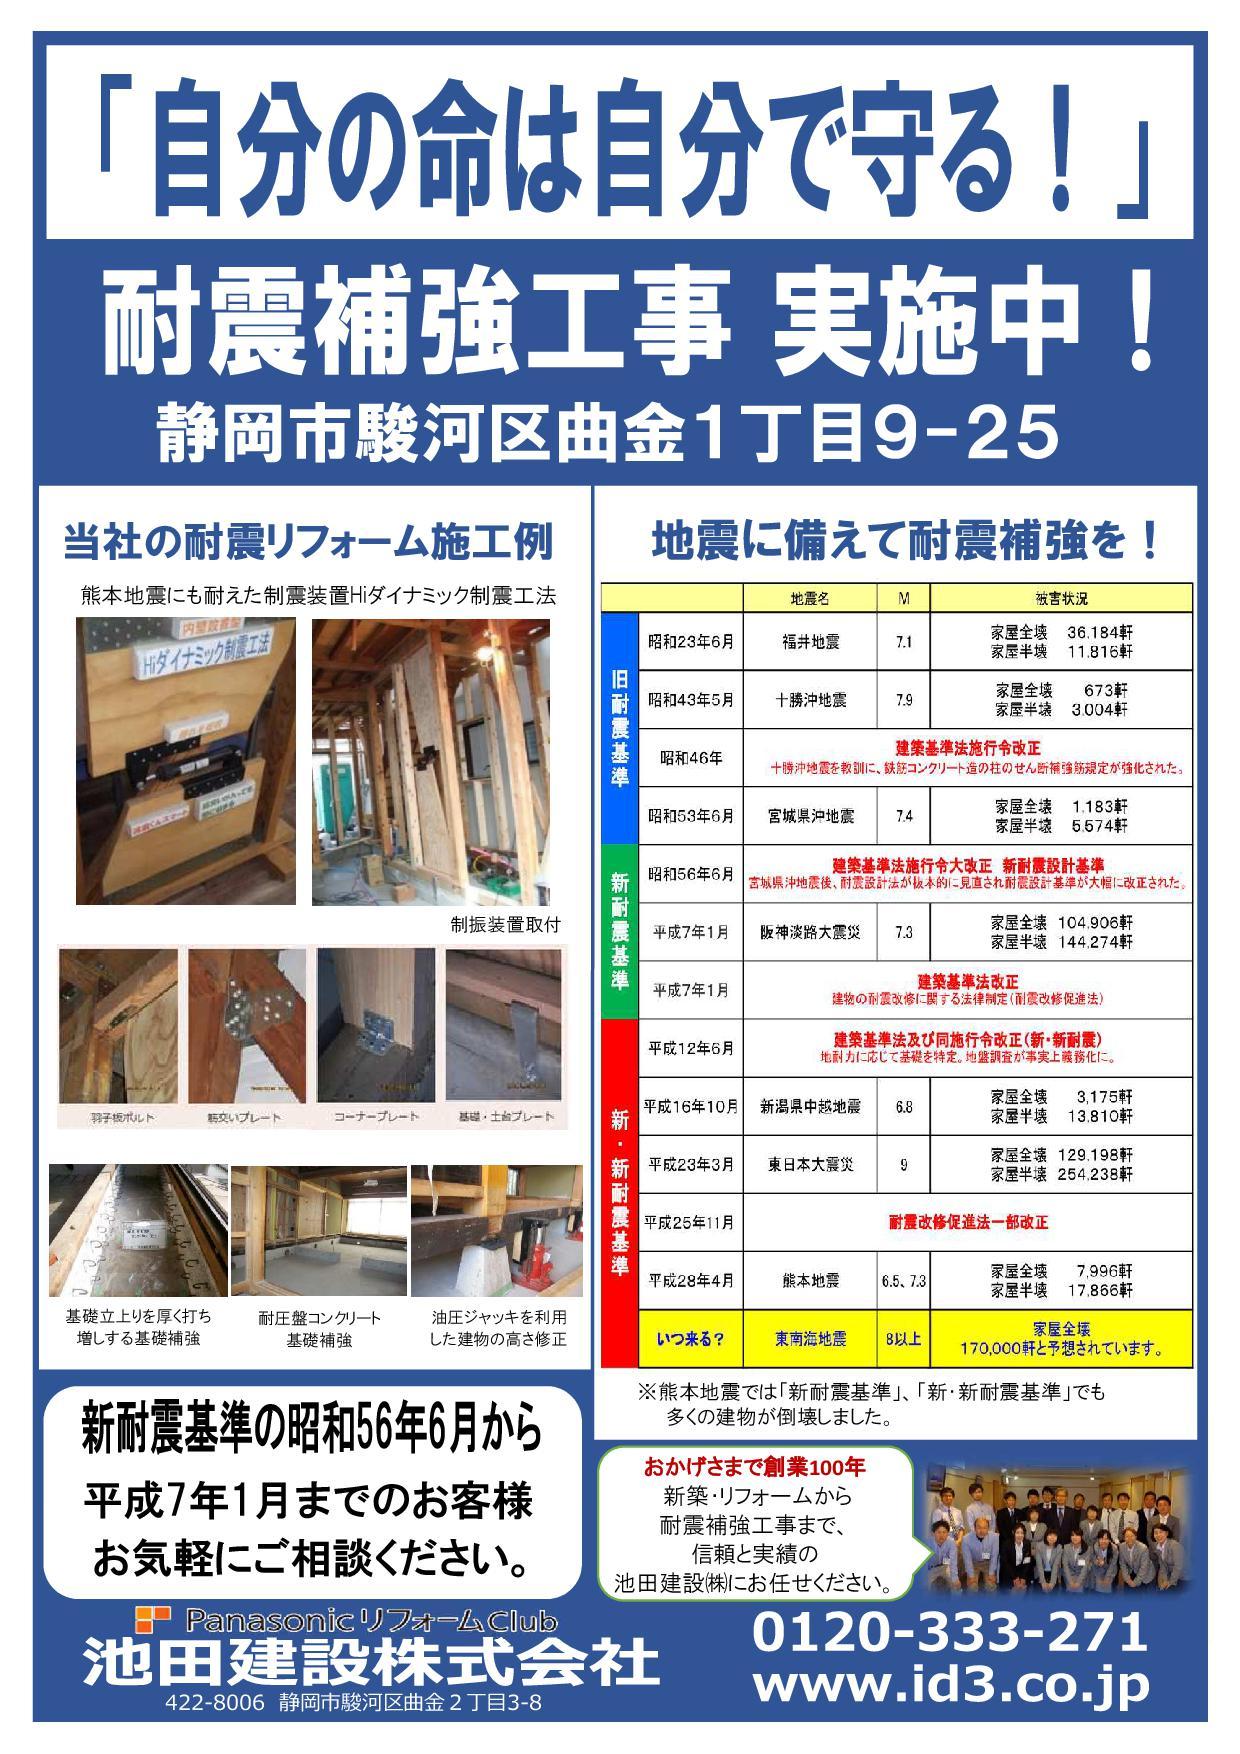 H290923242櫻井様邸耐震リフォーム見学会チラシ